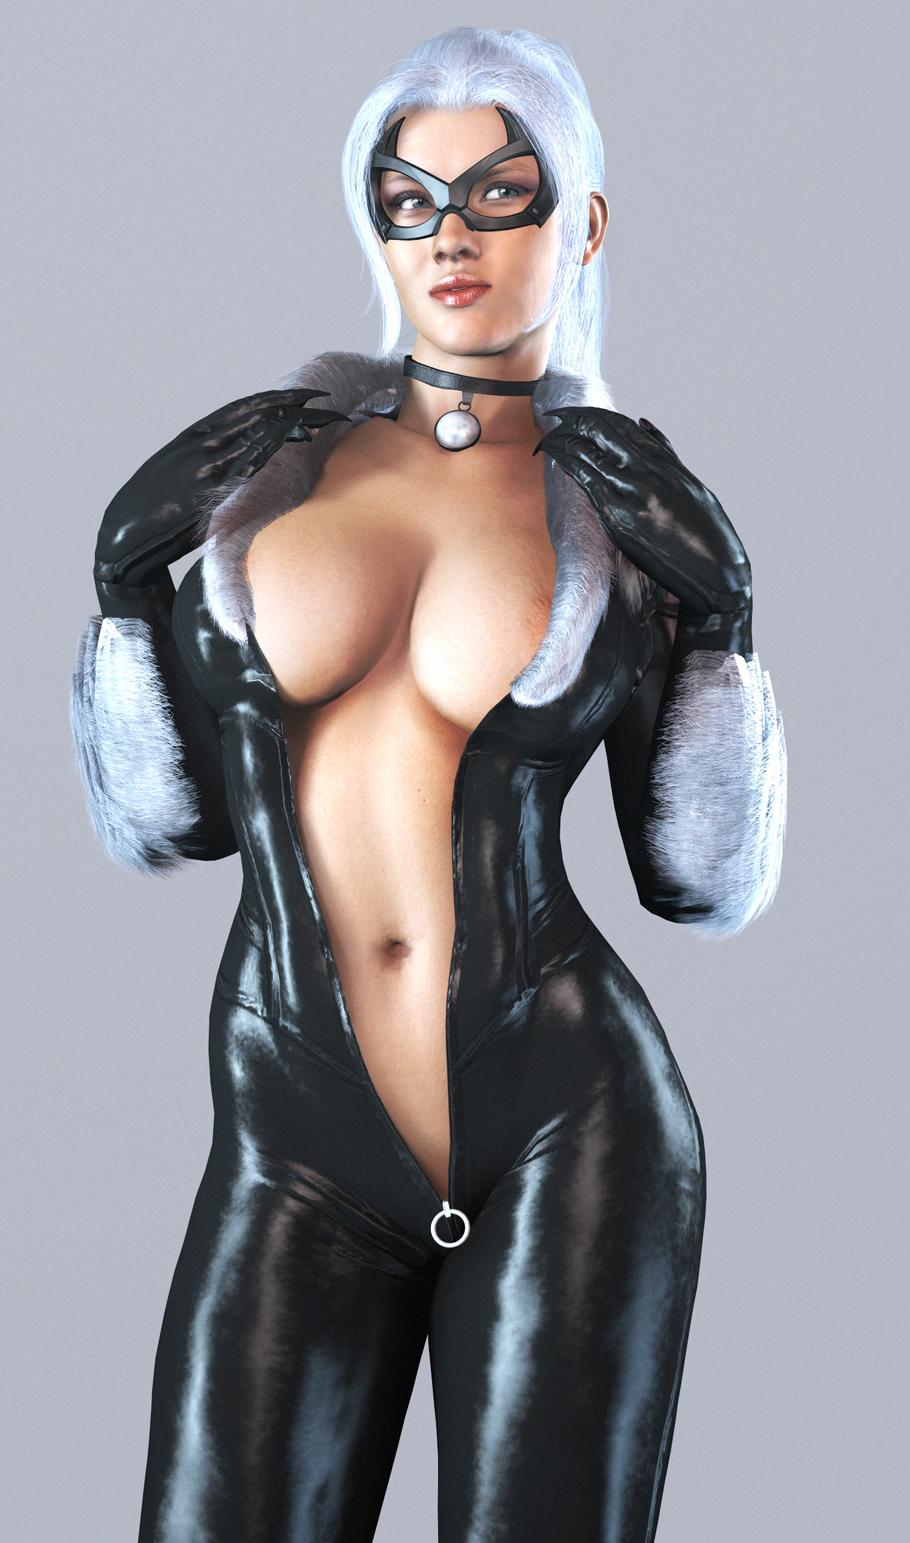 black cat ps4 spider man Moshi mo youmuin no ojisan ga saimin wo oboetara